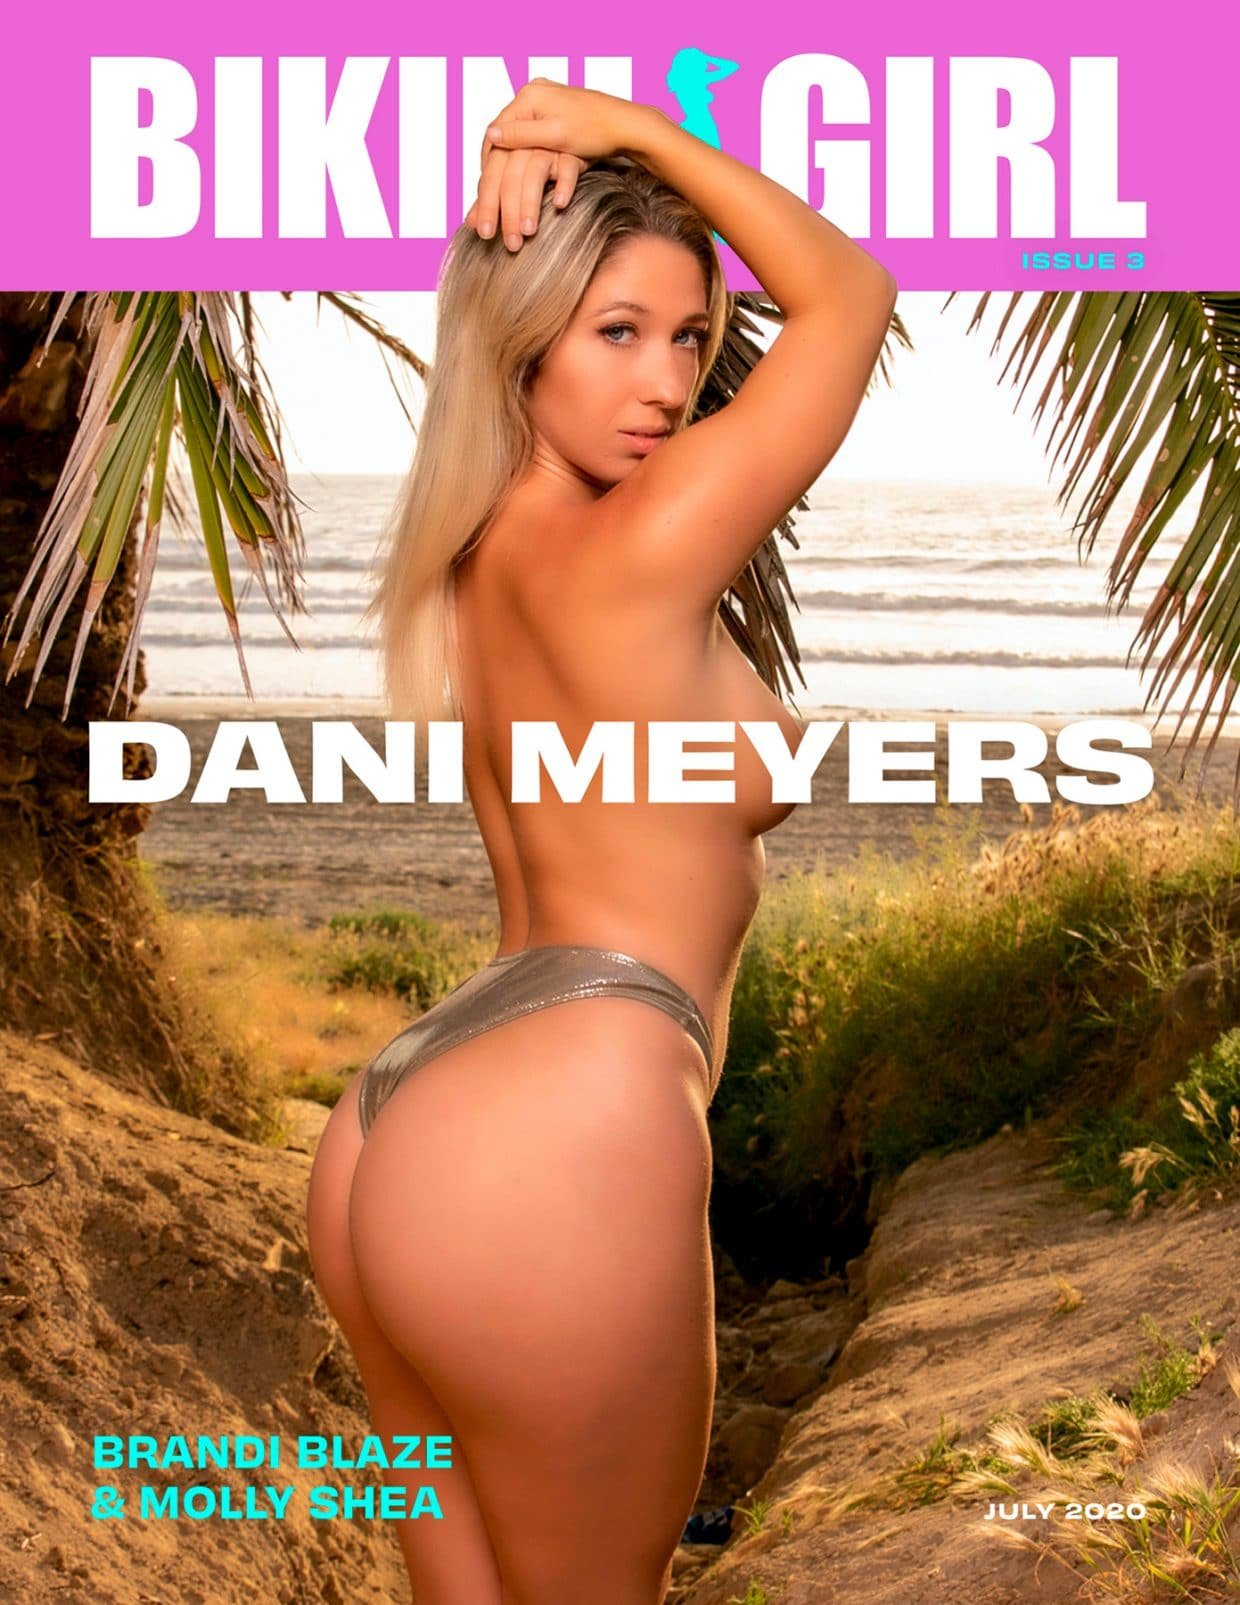 Bikini Girl - October 2020 - Cahri Taro 2